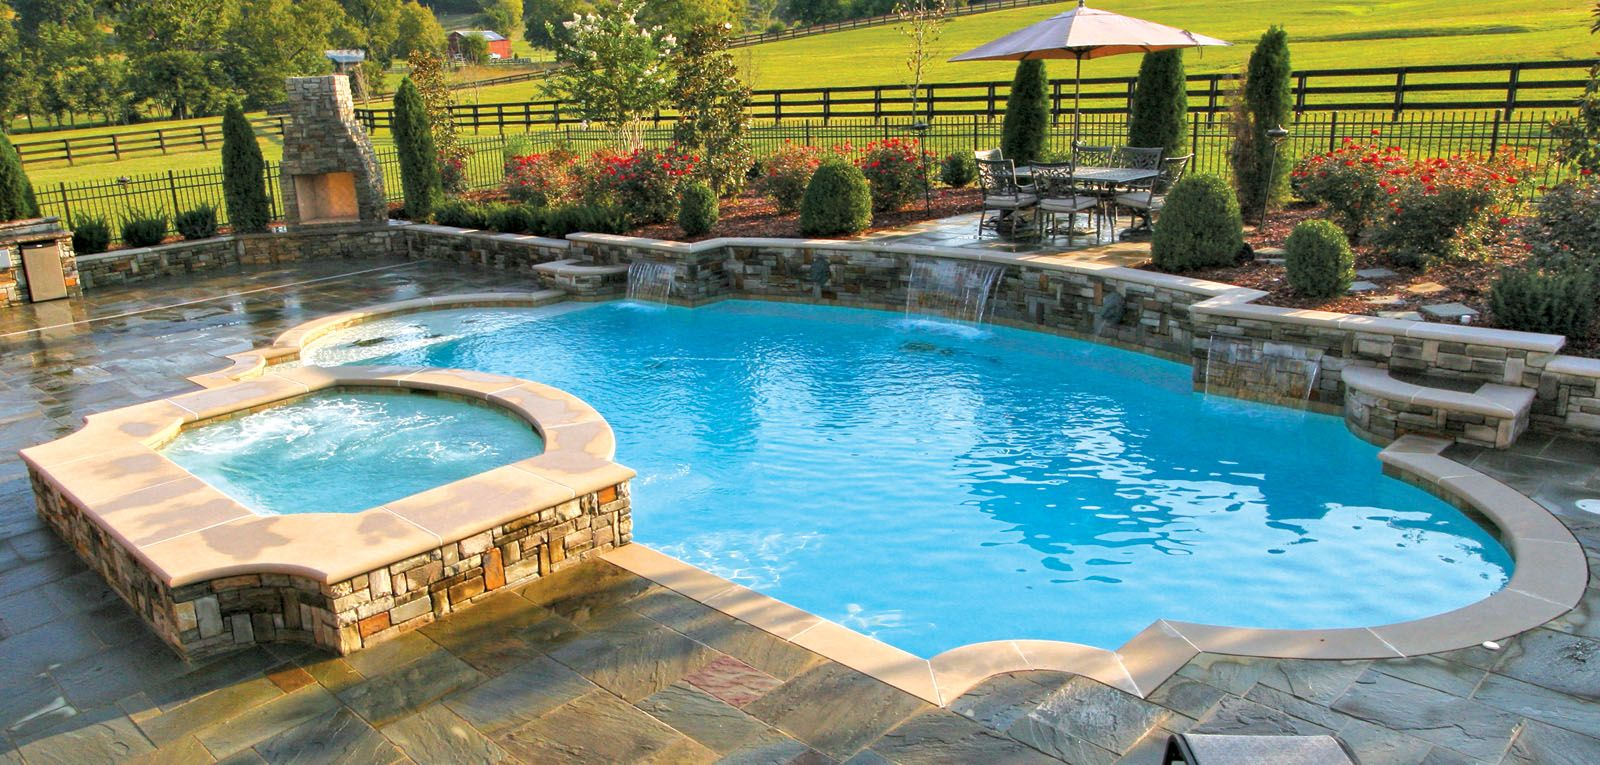 Roman / Grecian Pools   Blue Haven Custom Swimming Pool And Spa Builders   Pool  Designs   Pinterest   Roman, Swimming Pools And Spa